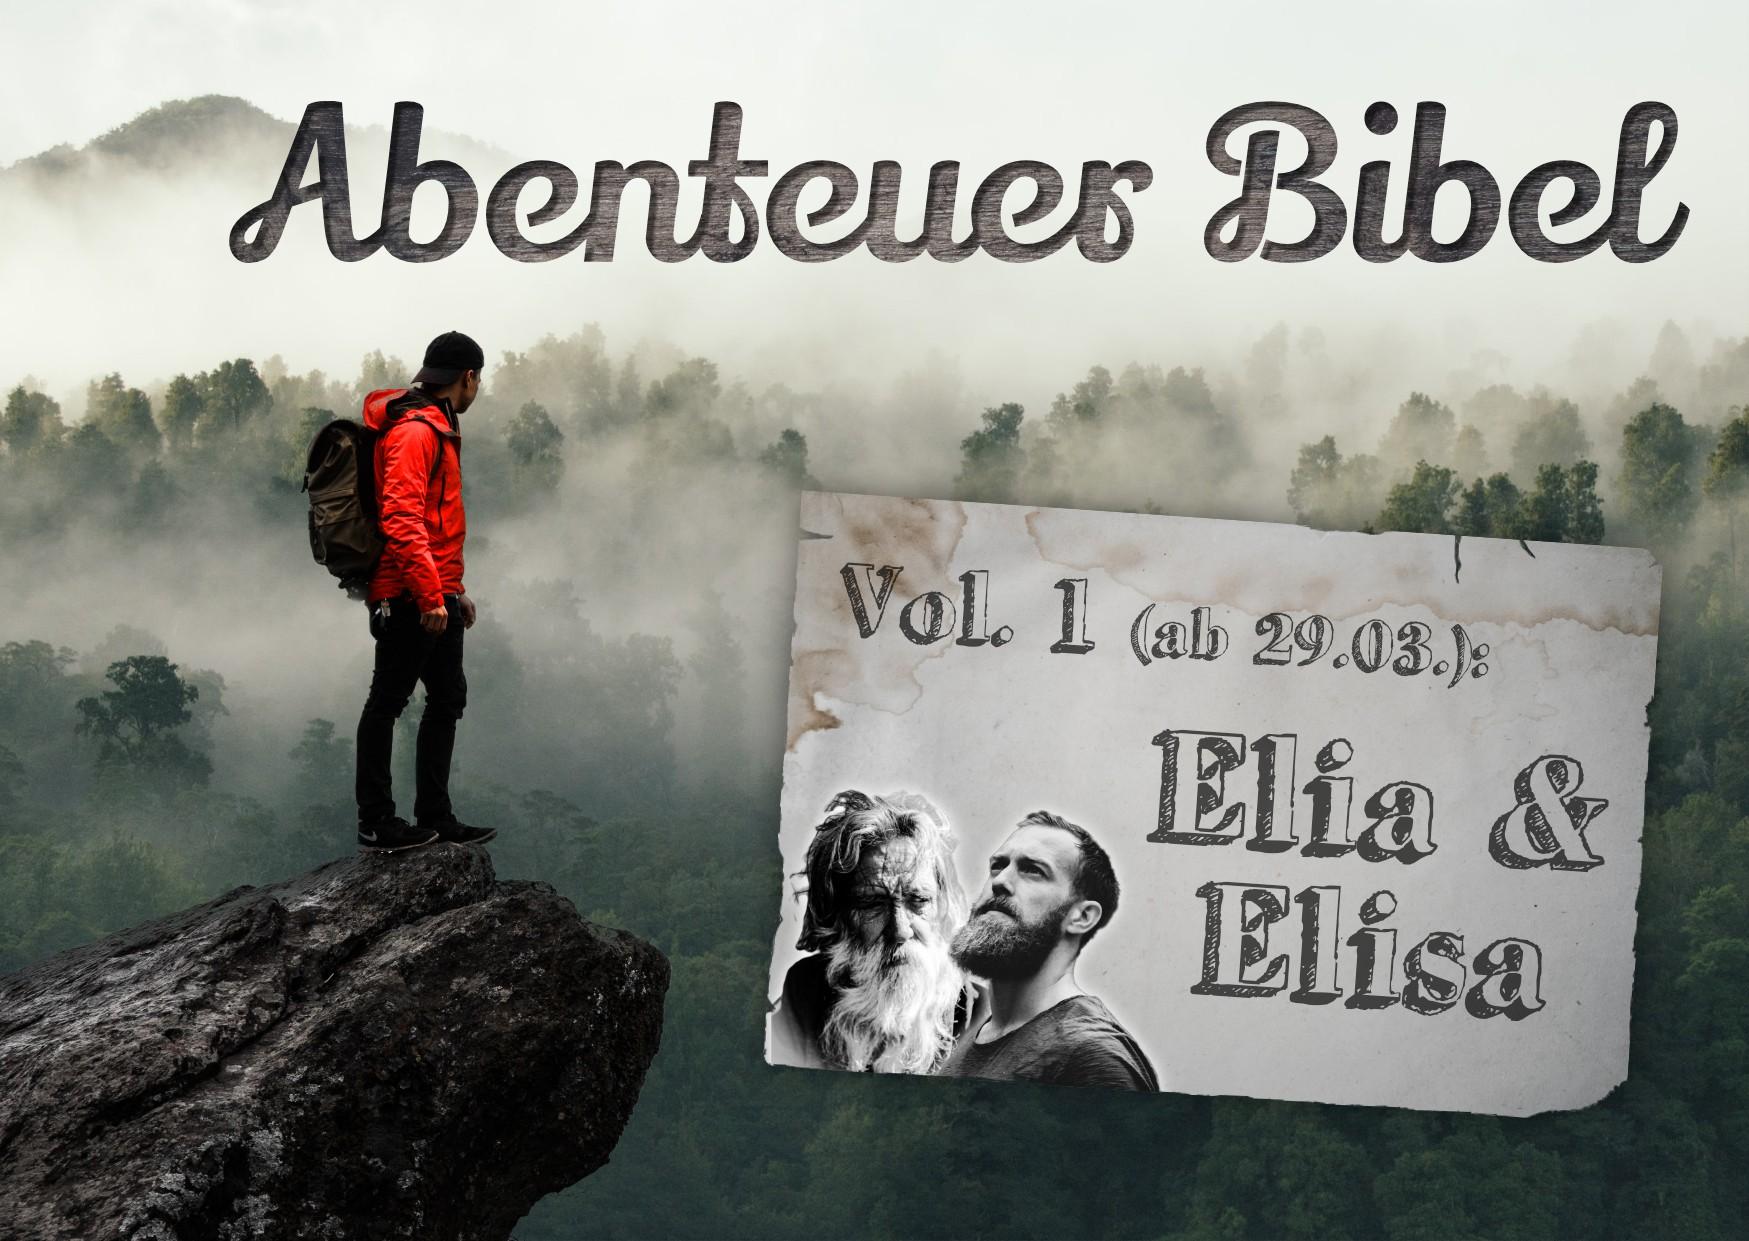 Abenteuer Bibel - Elia und Elisa